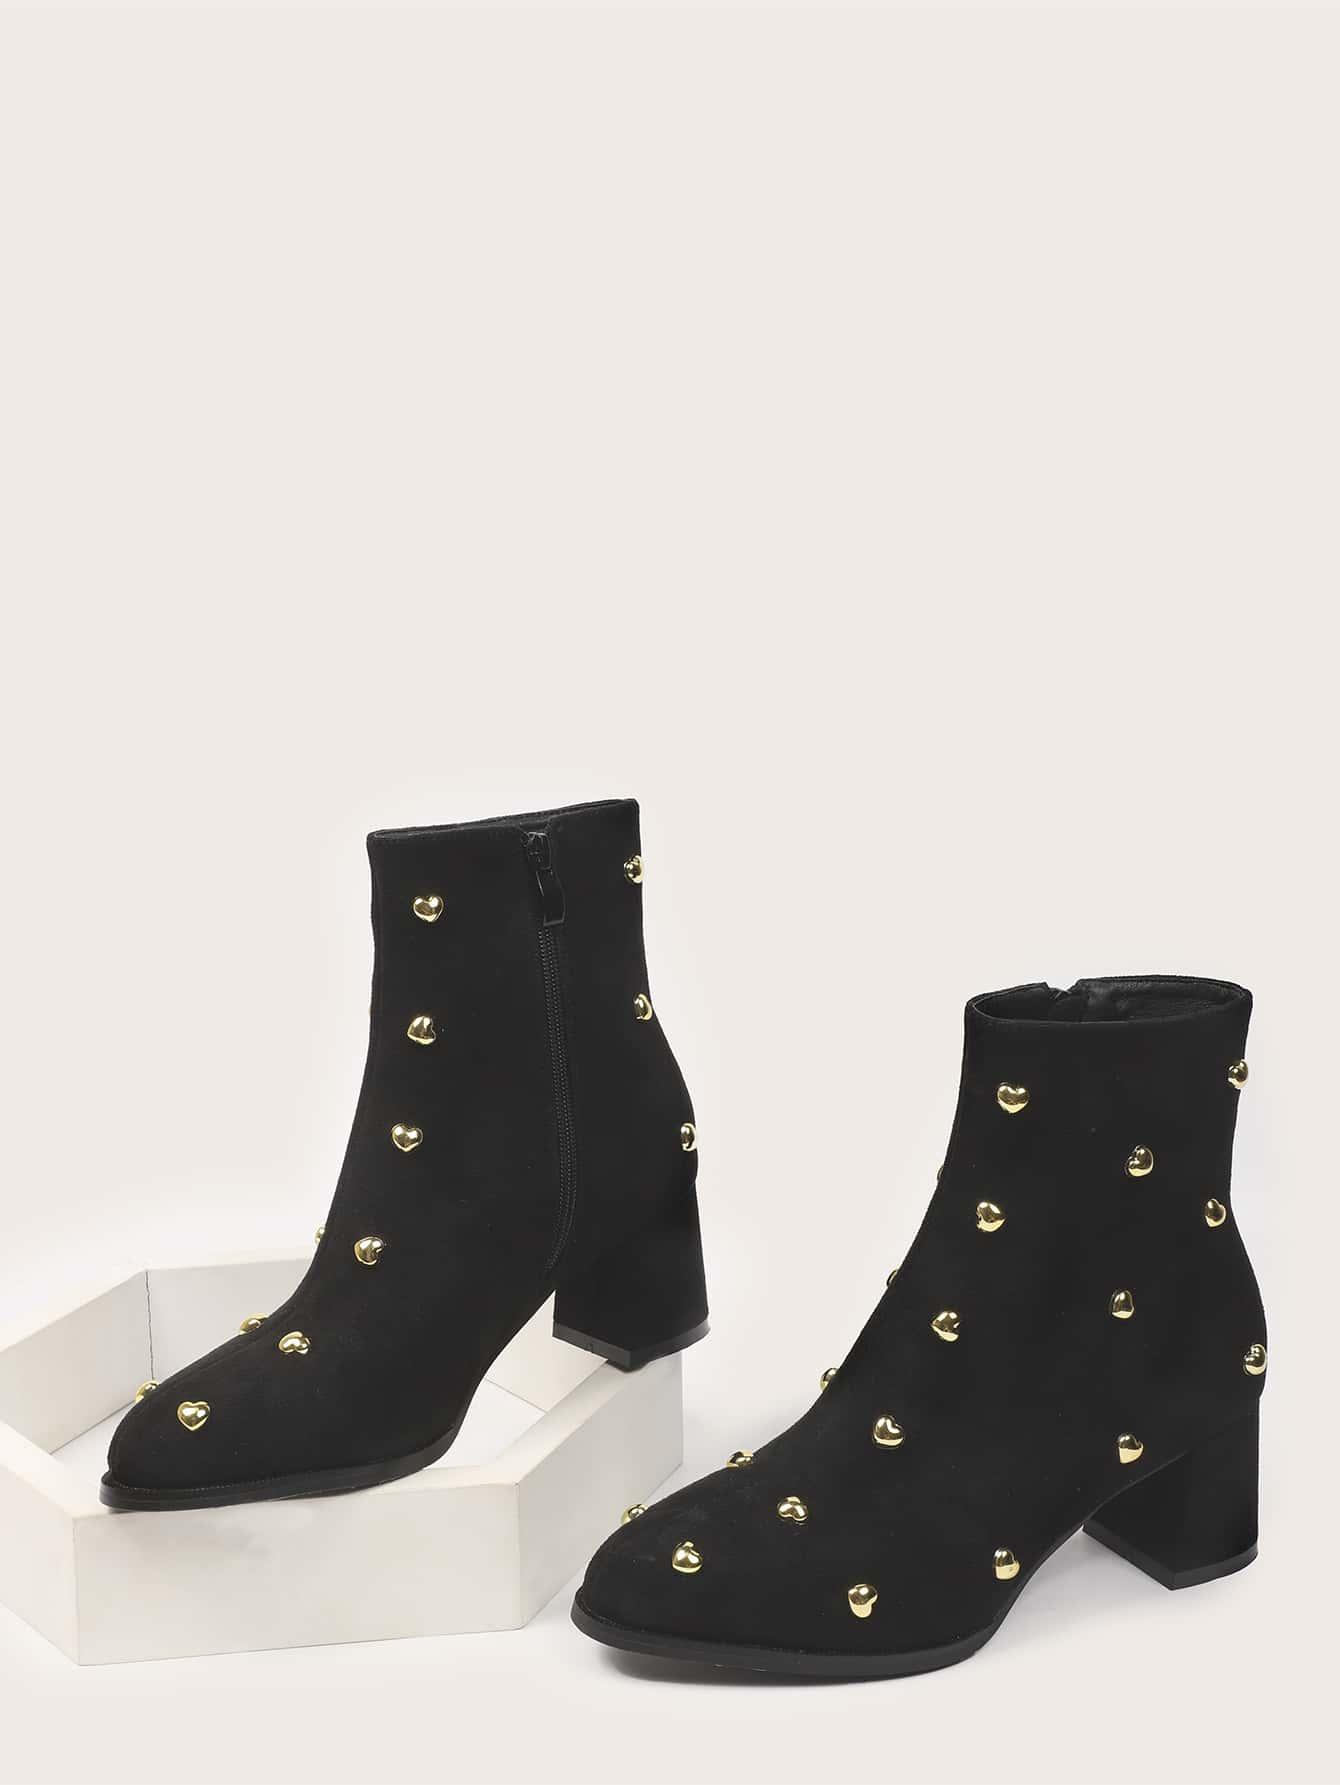 Studded Decor Side Zip Chunky Heeled Boots